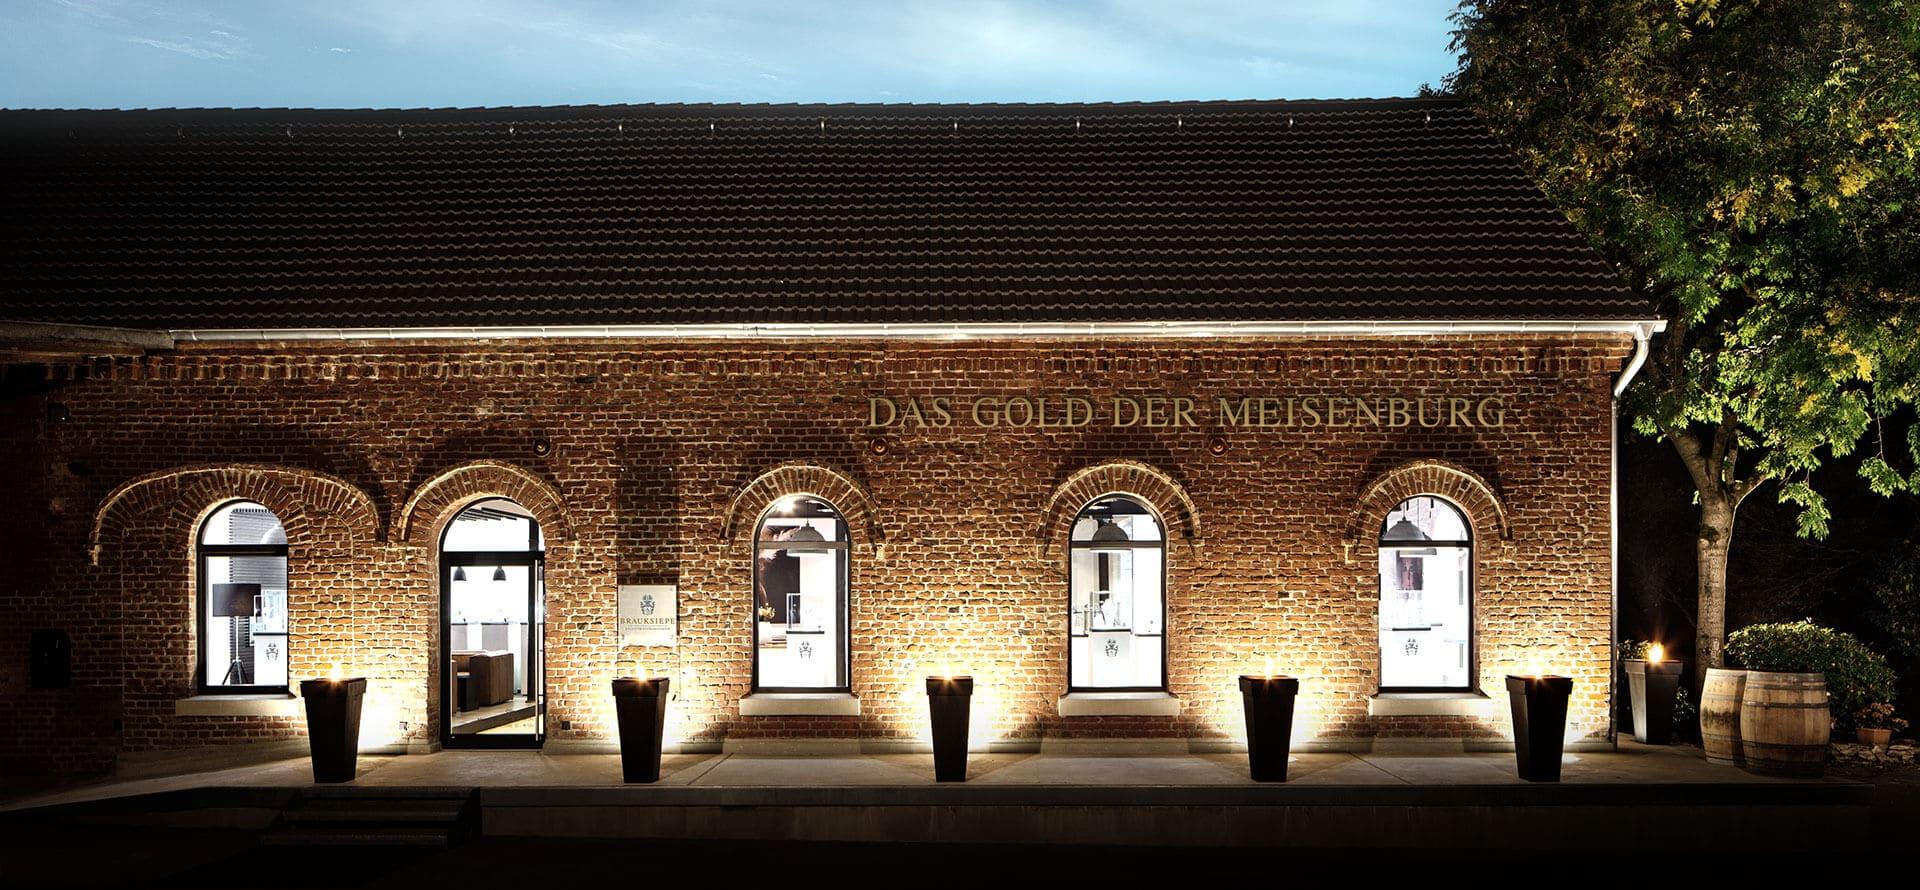 Die Meisenburg in Essen Kettwig